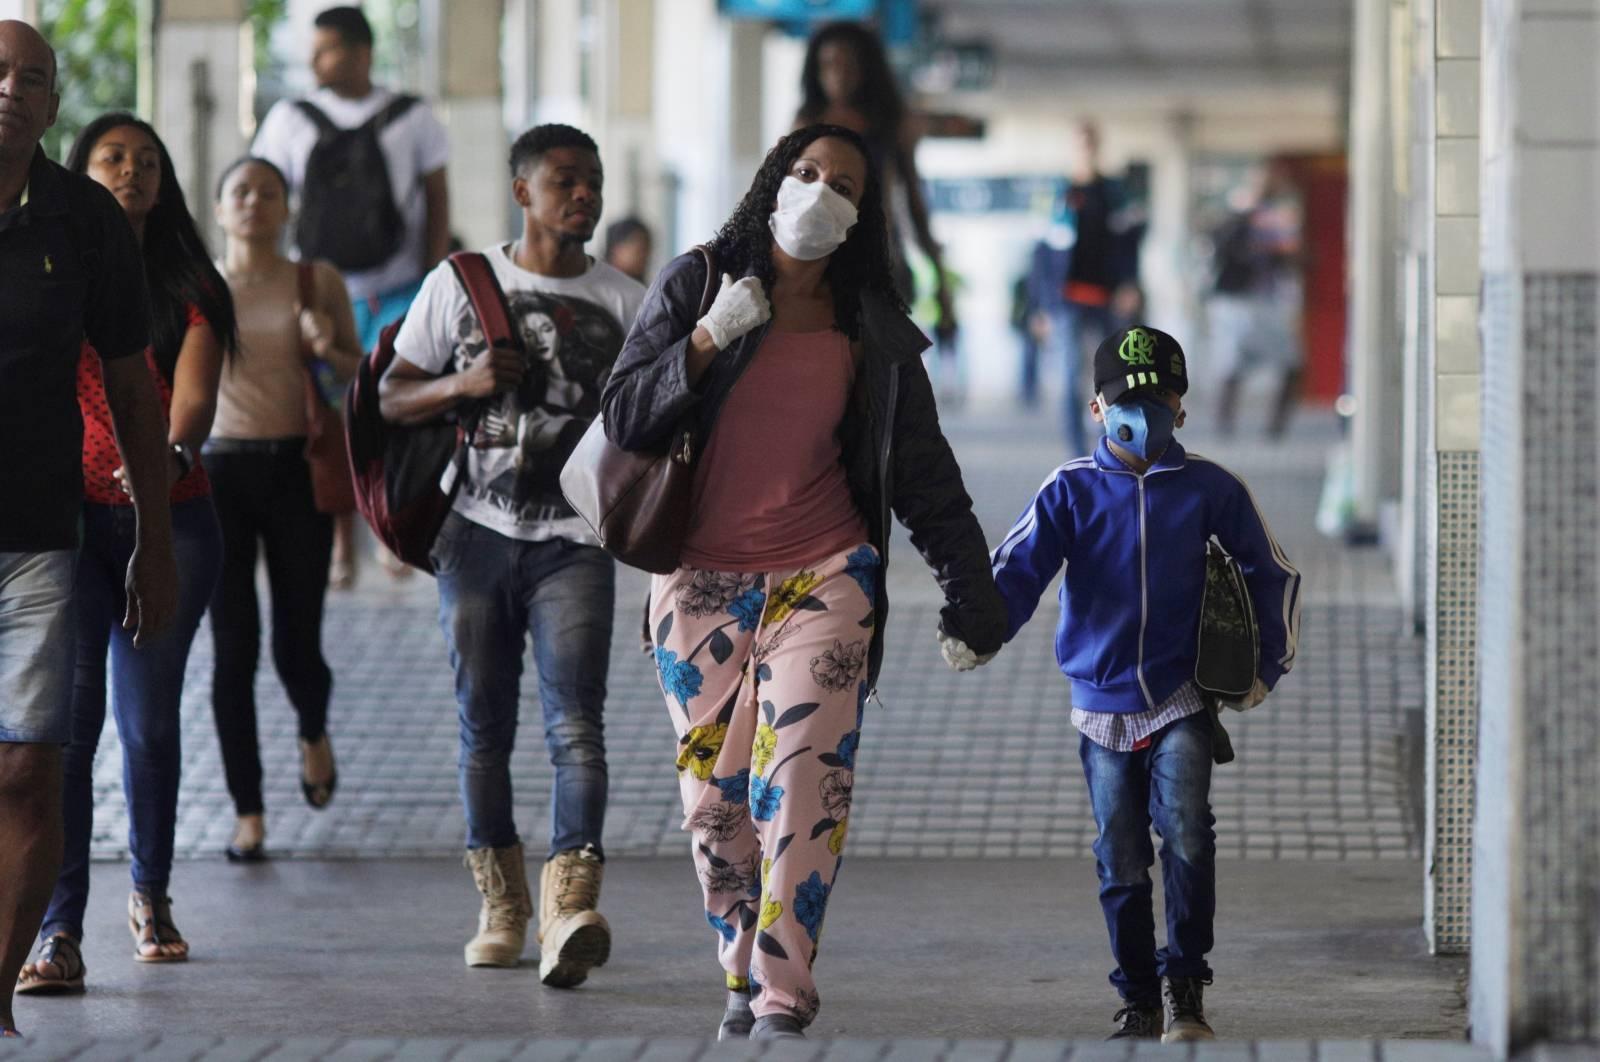 Passengers walk at Central do Brasil train station during the coronavirus disease (COVID-19) outbreak in Rio de Janeiro